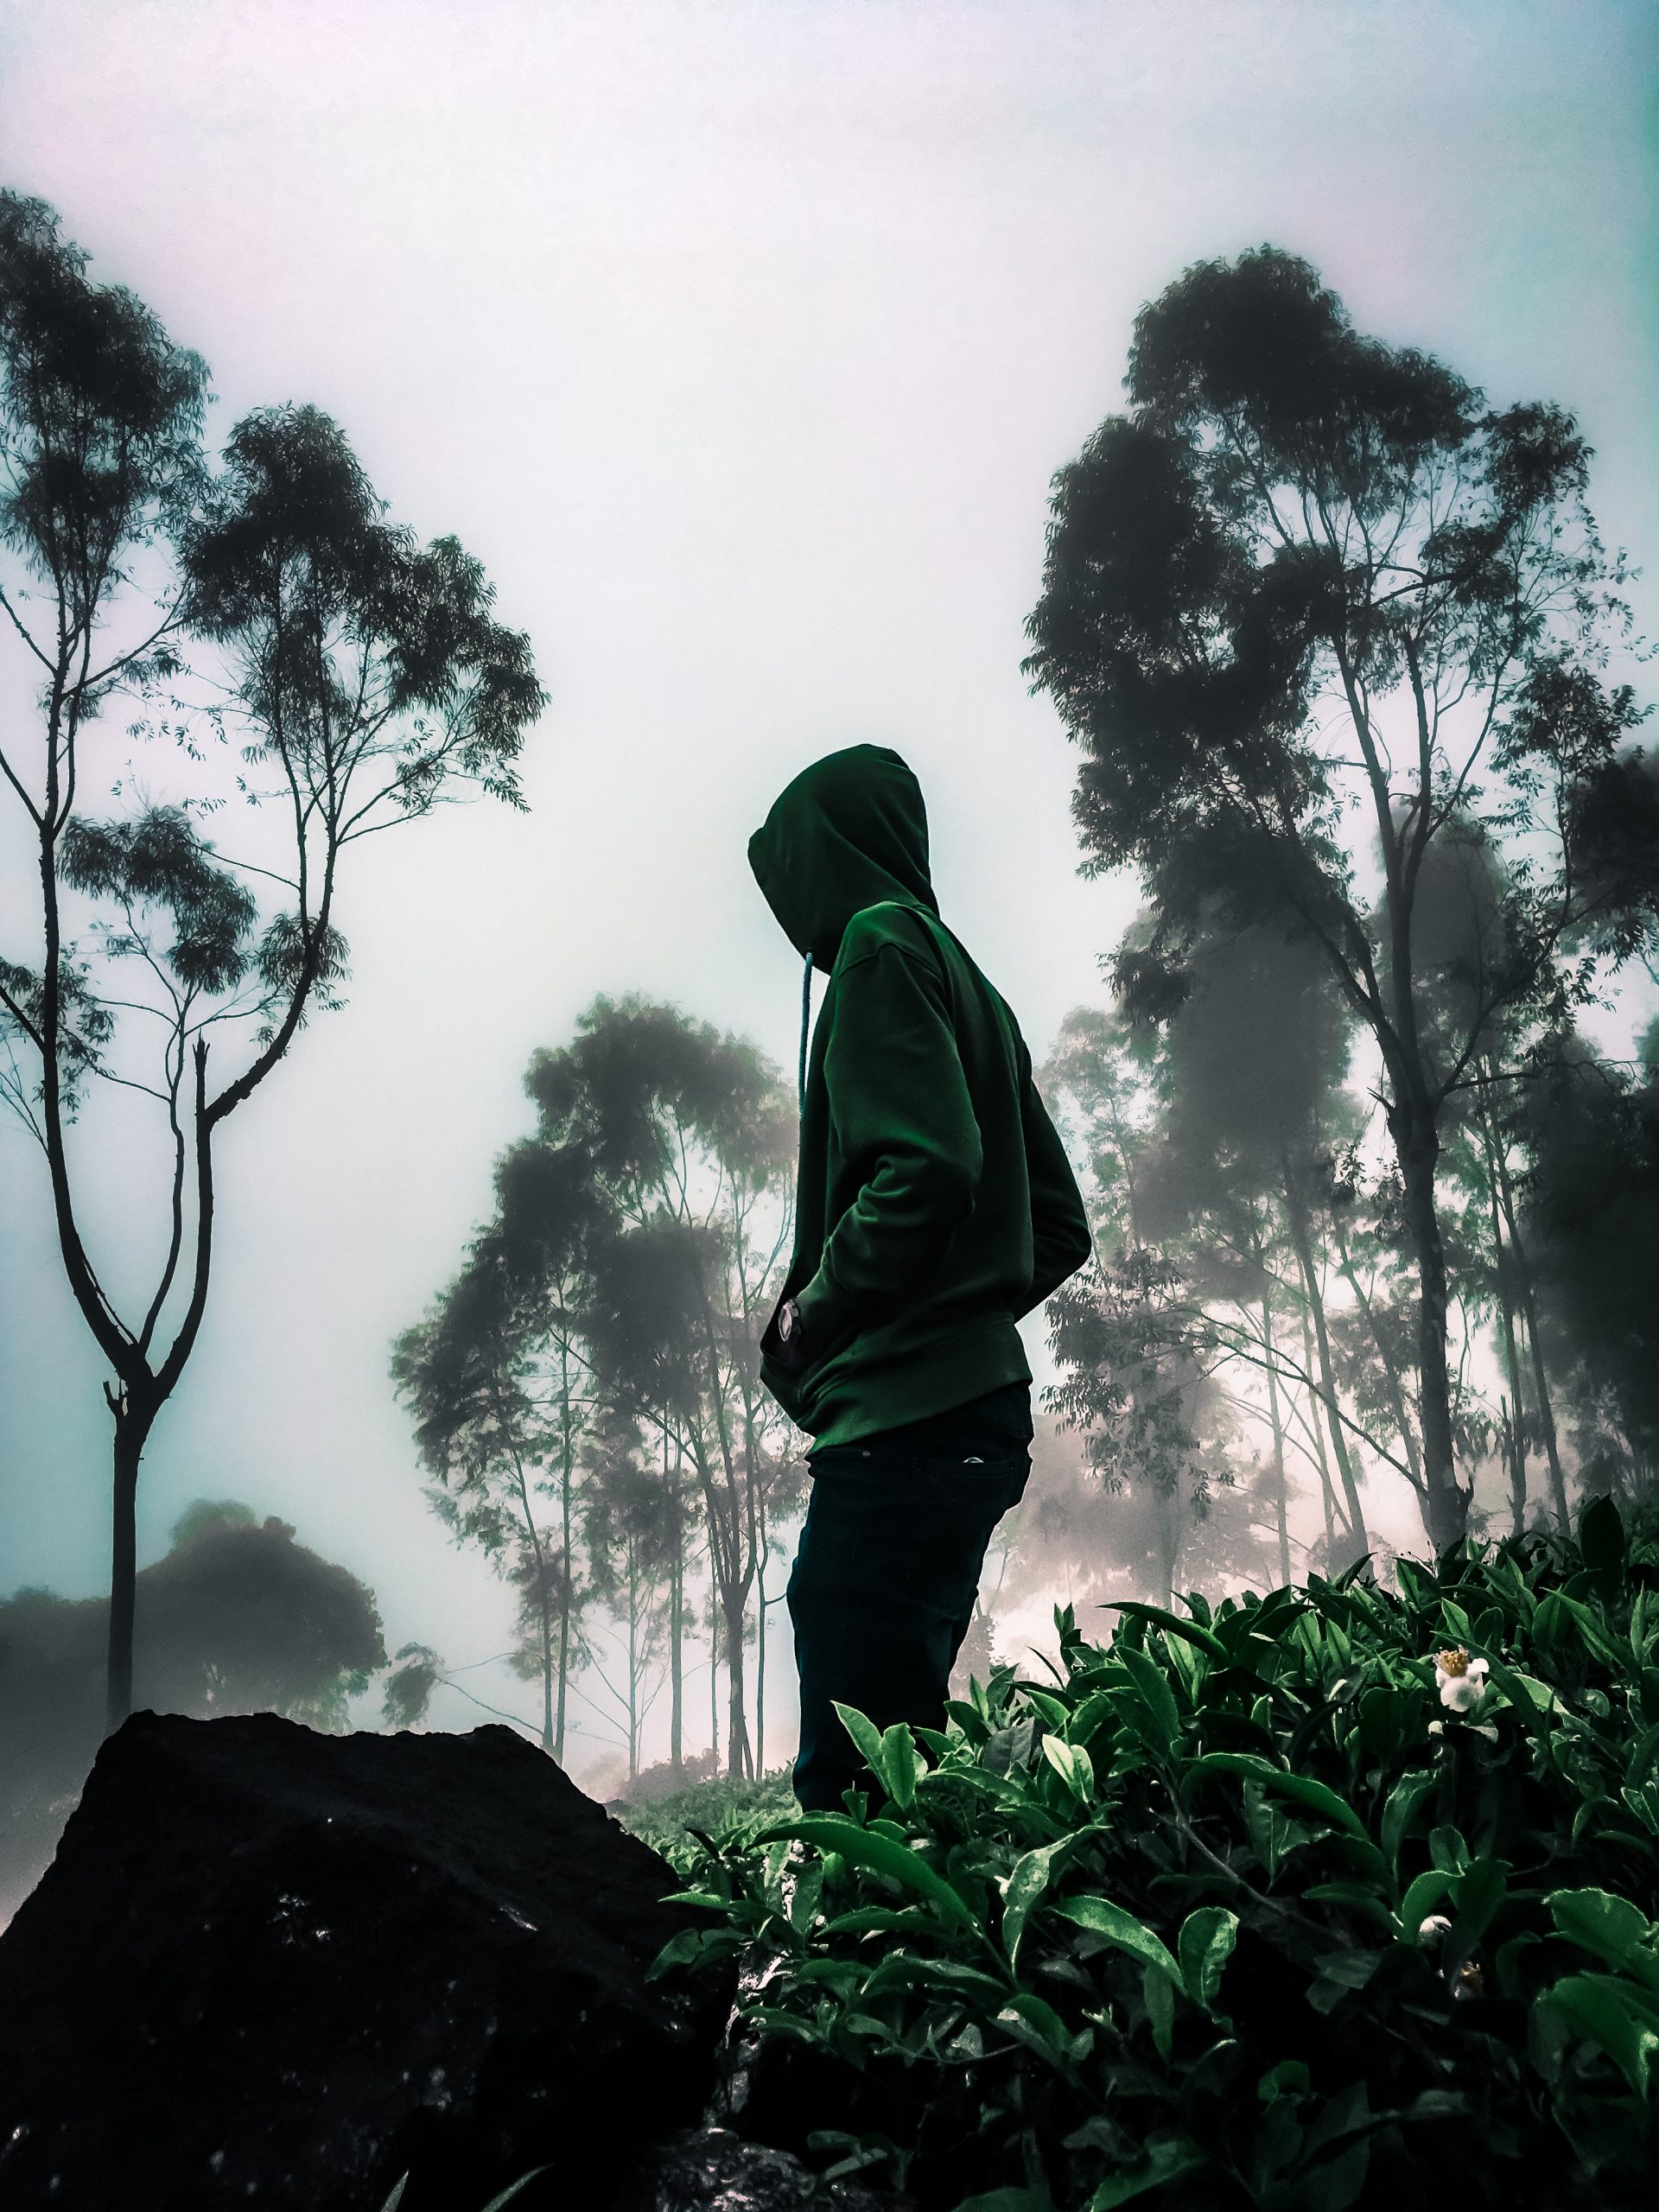 A hoodie boy on a hill